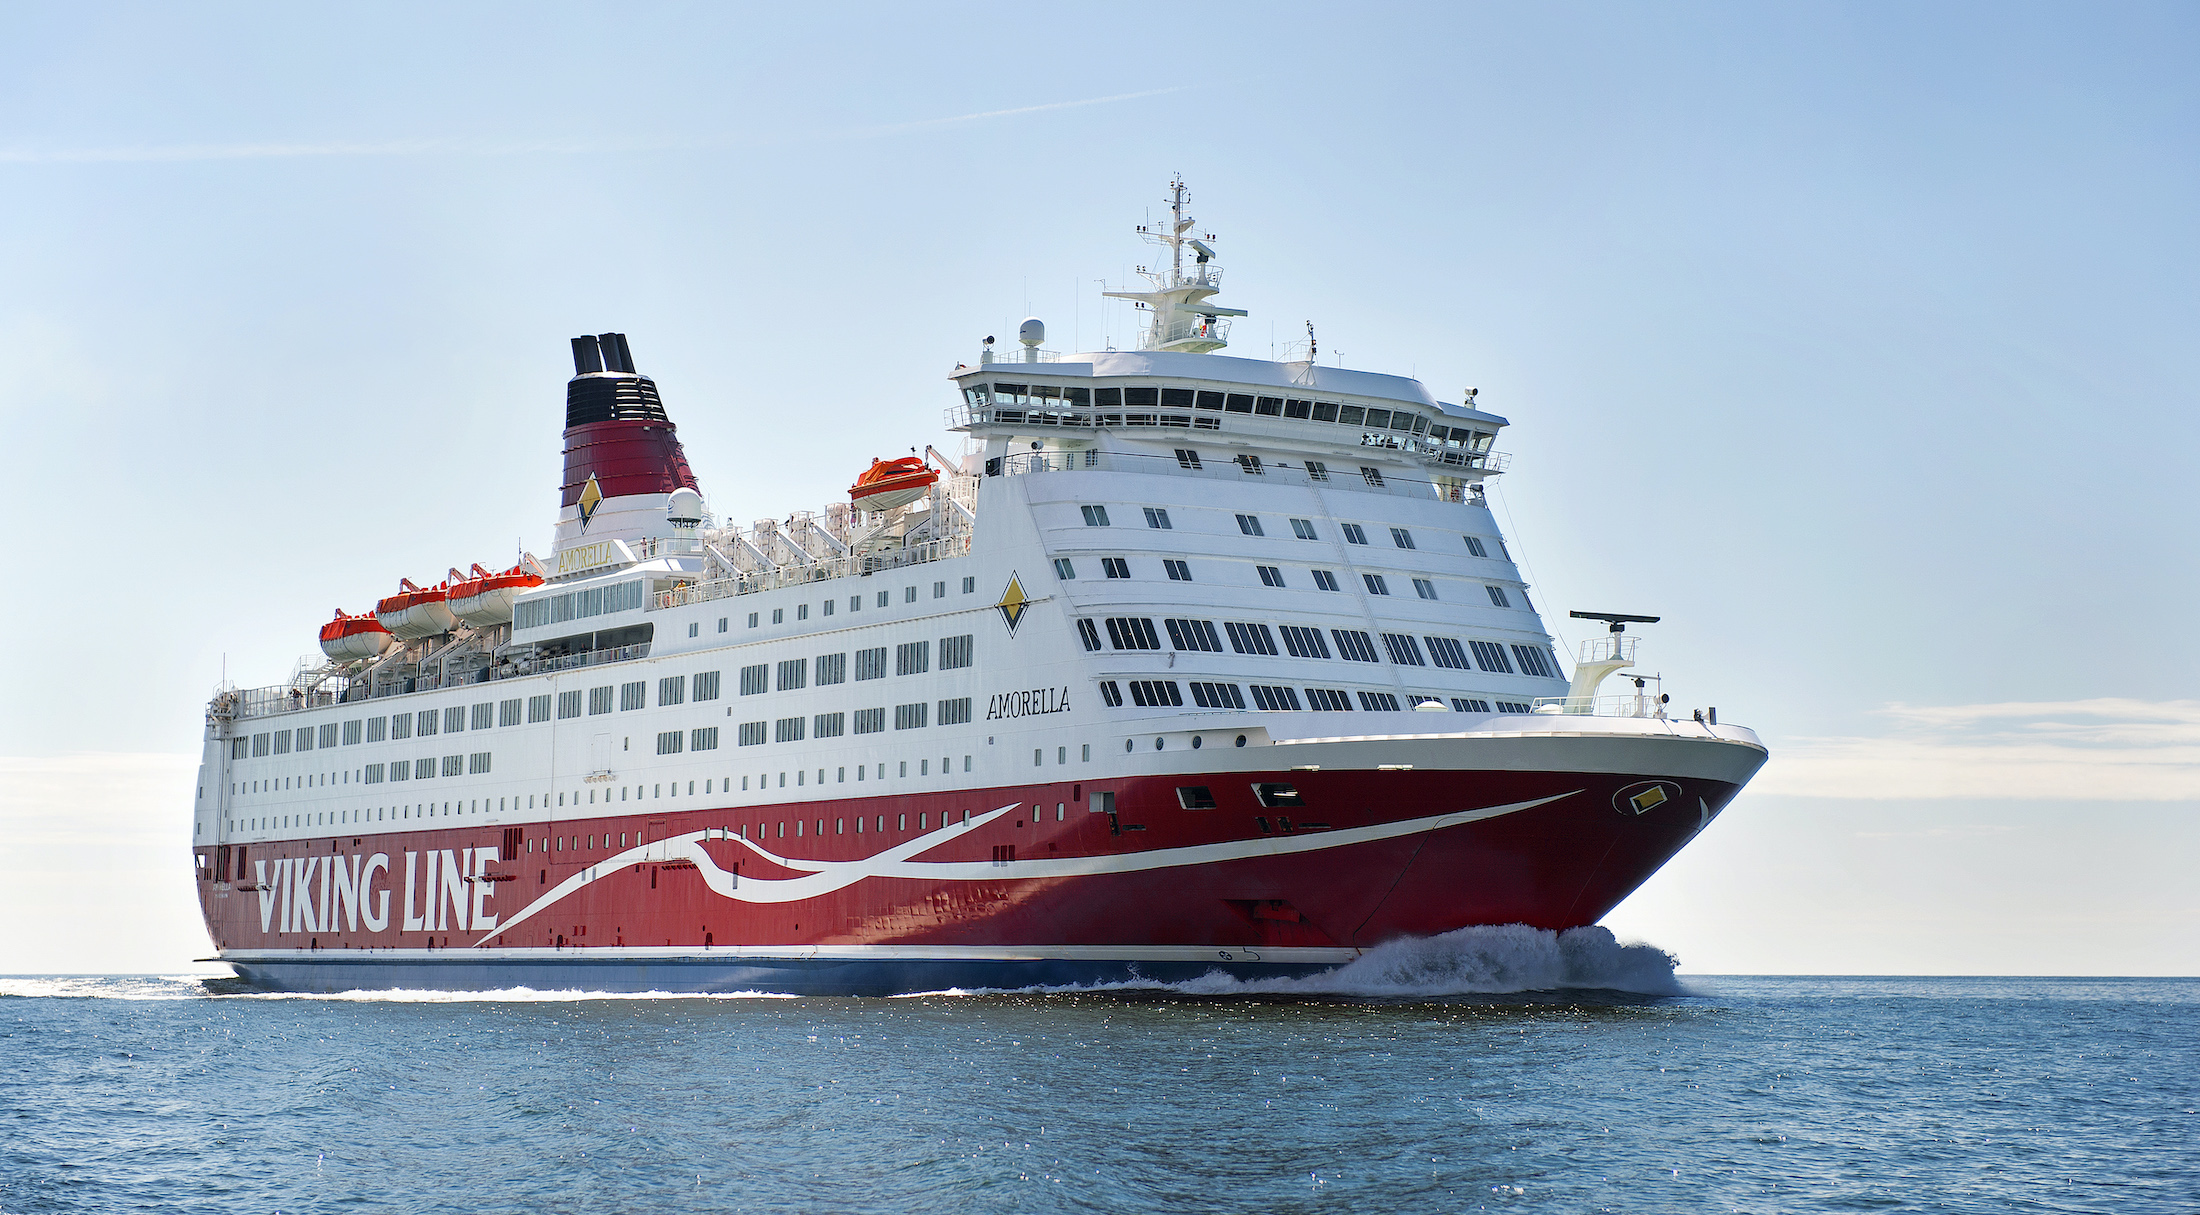 Viking Line - Amorella 船只照片